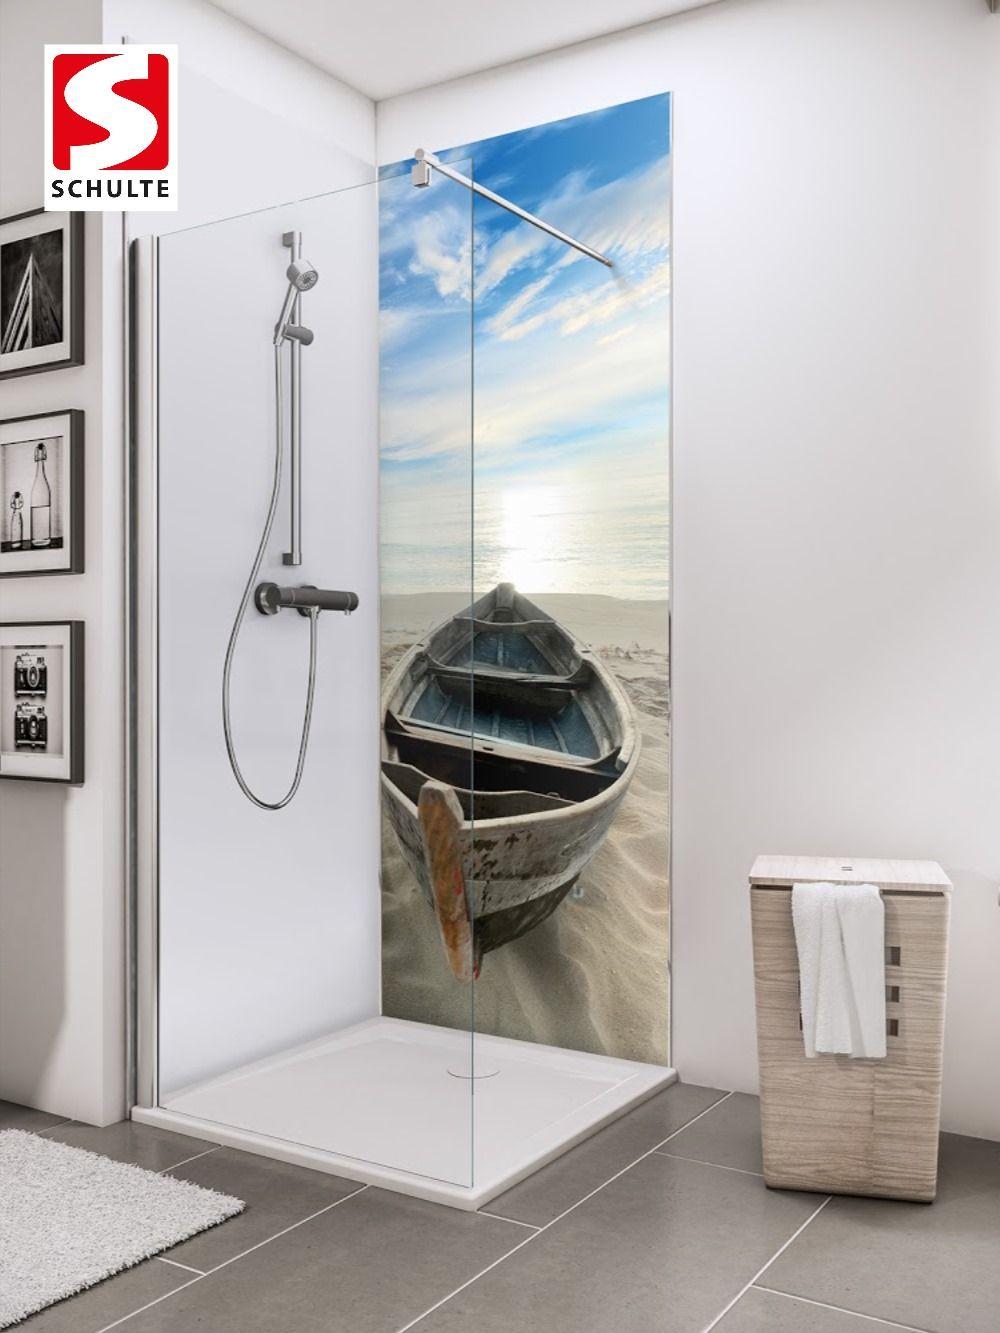 Schulte Duschruckwande Decodesign Foto Ruderboot Am Strand Paneel Wandverkleidung In 2020 Dusche Ruderboot Duschruckwand